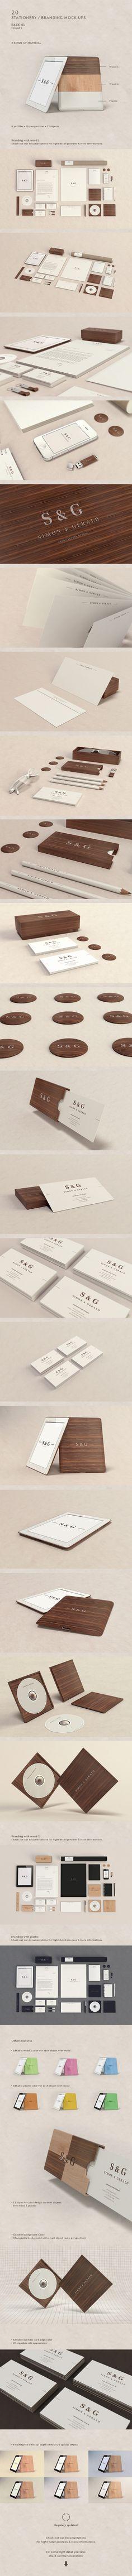 Stationery / Branding Mock-Up - Woods & Plastic